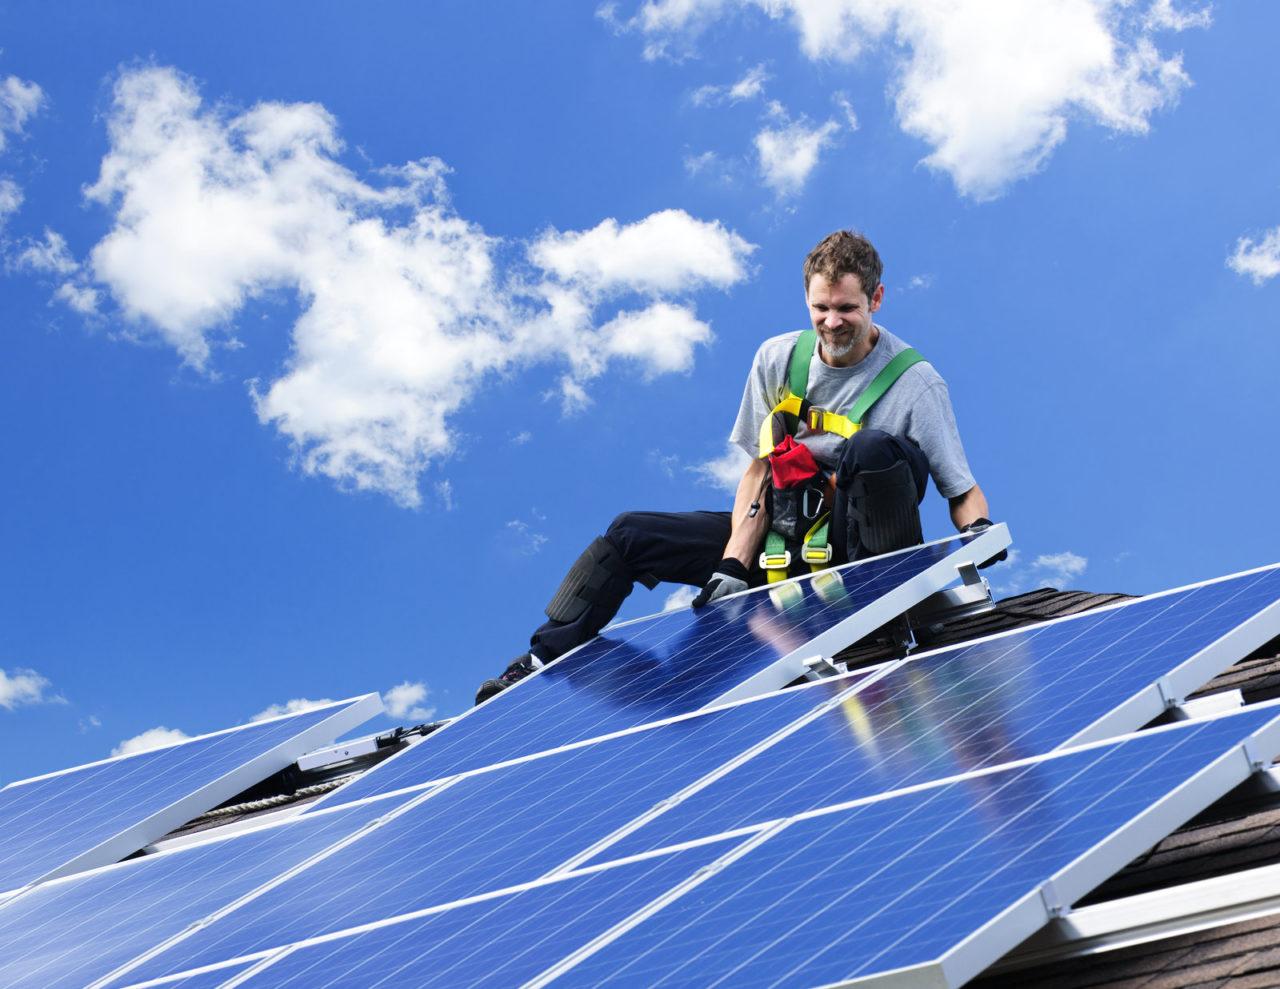 https://www.skilledelectrical.co.nz/wp-content/uploads/2021/10/1732976_solar-panel-installation-1280x989.jpg